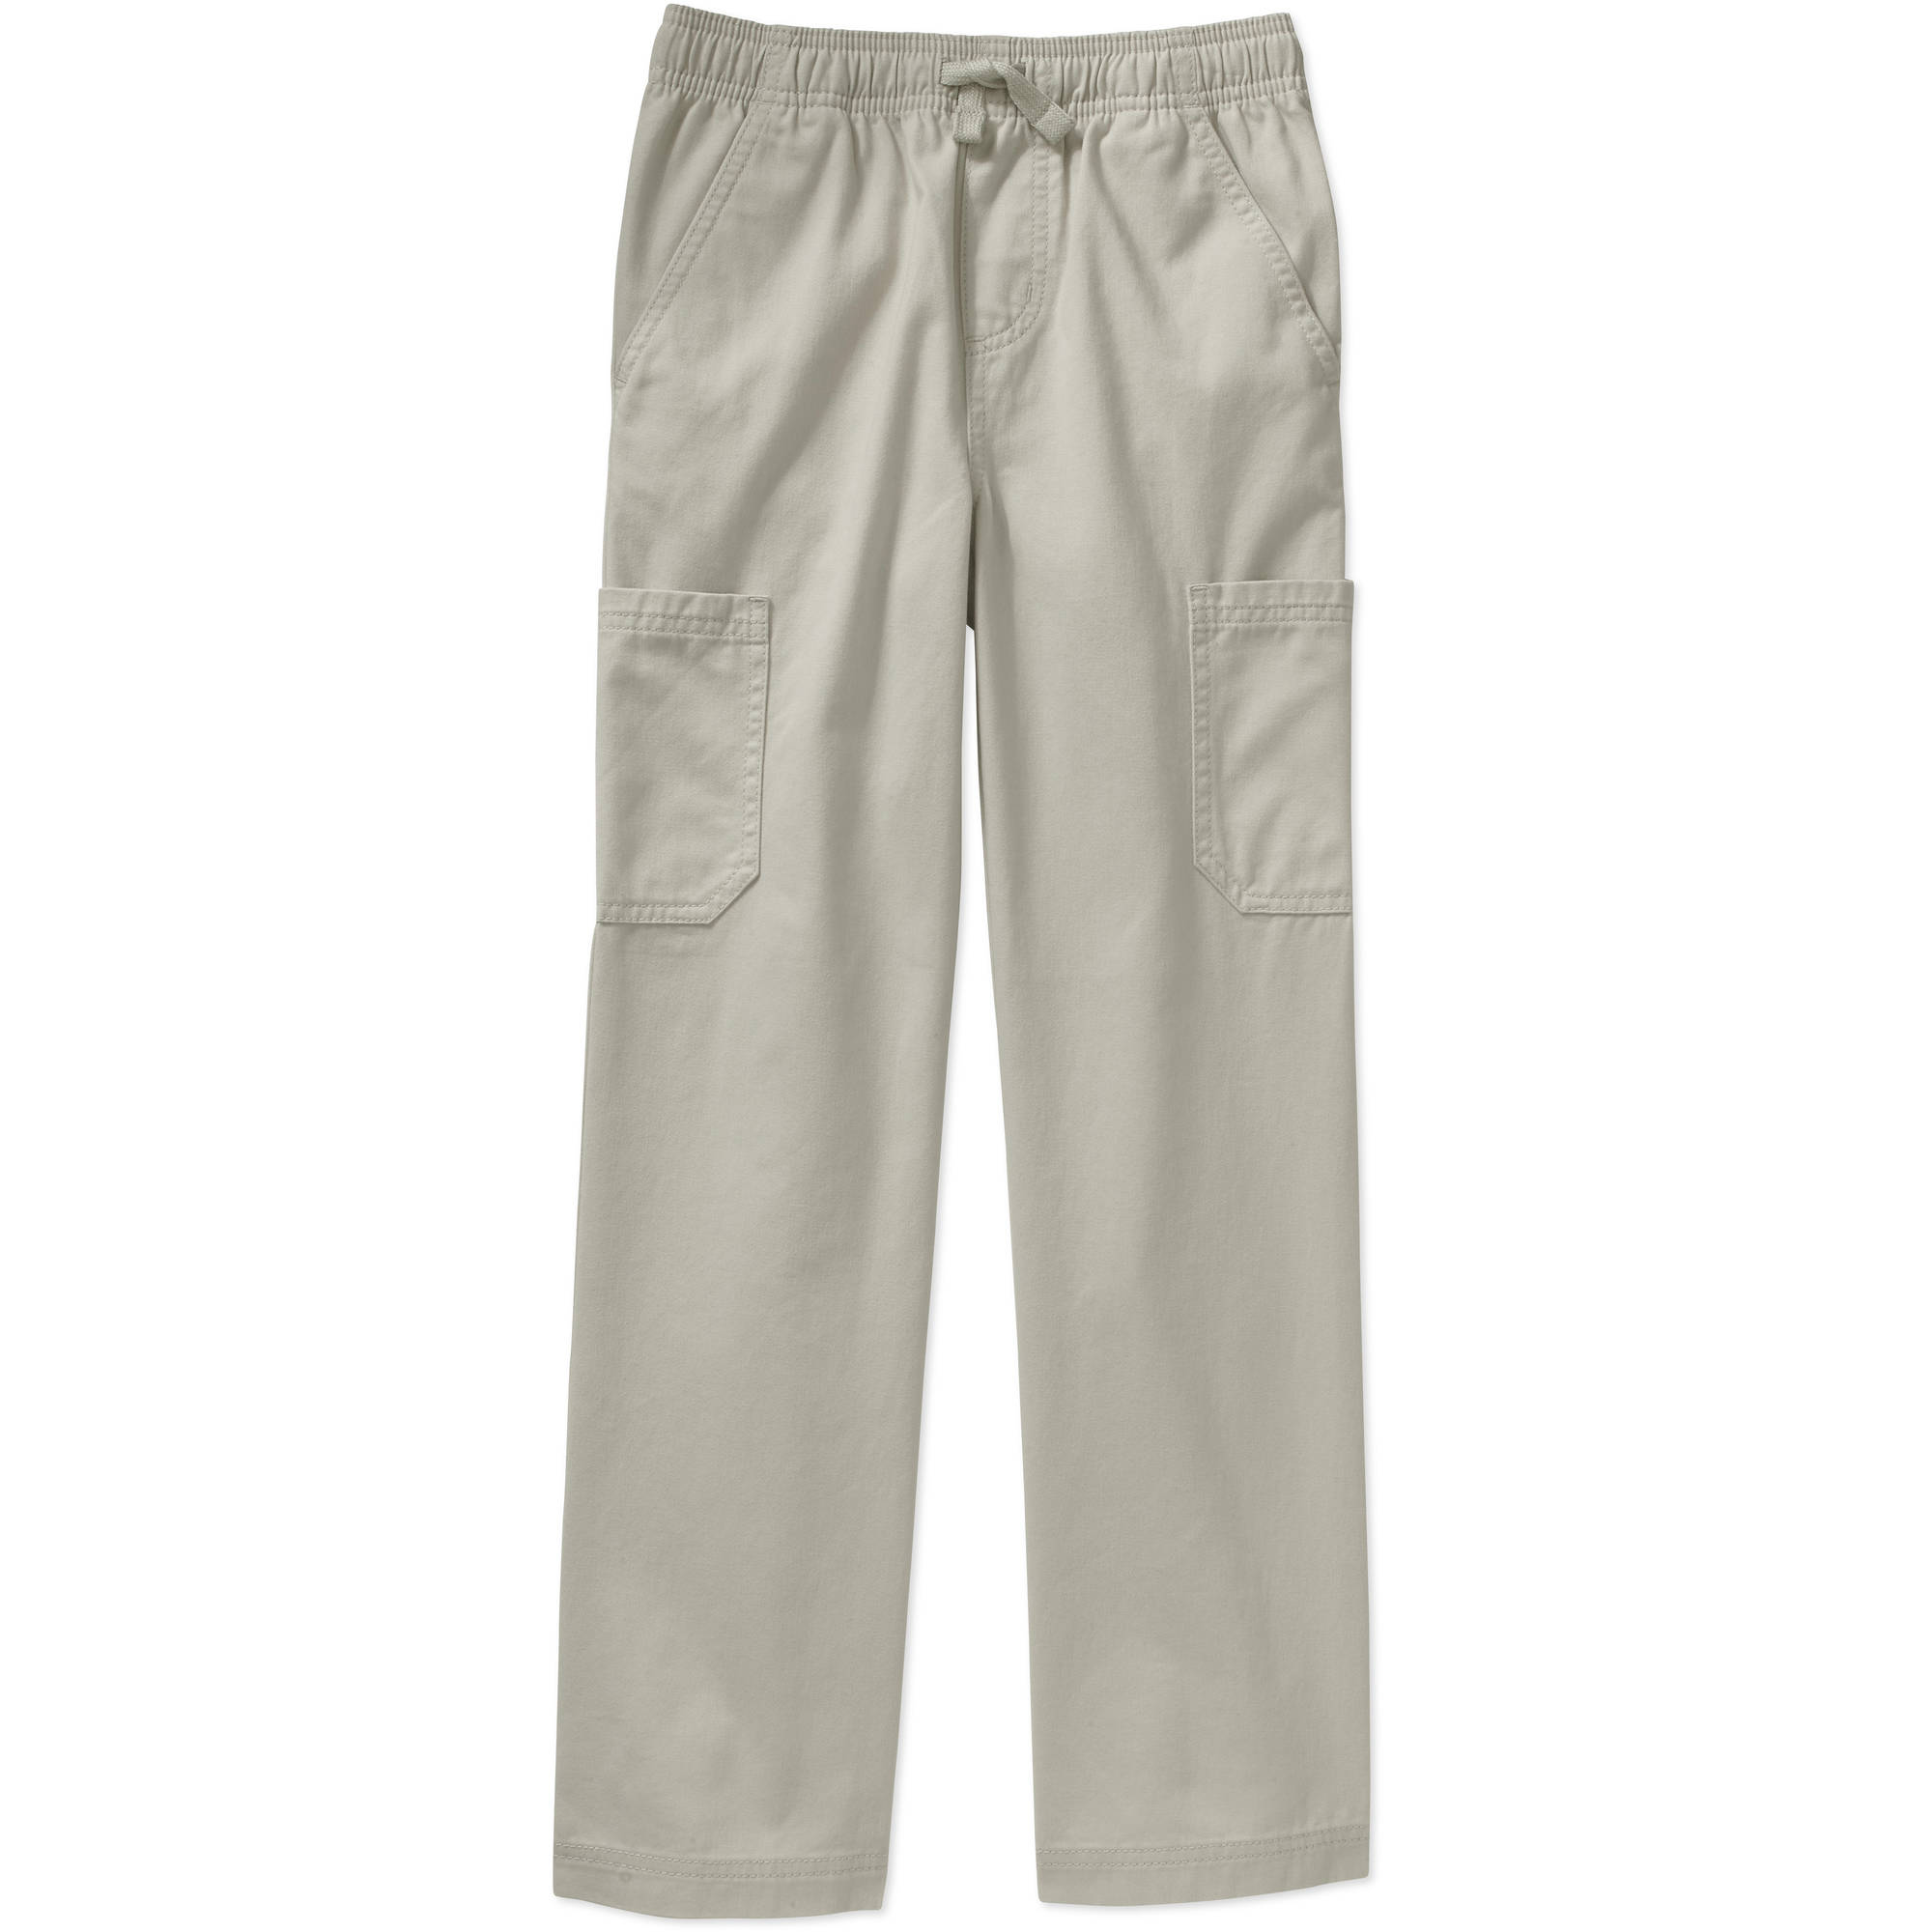 Faded Glory Boys' Pull On Pants